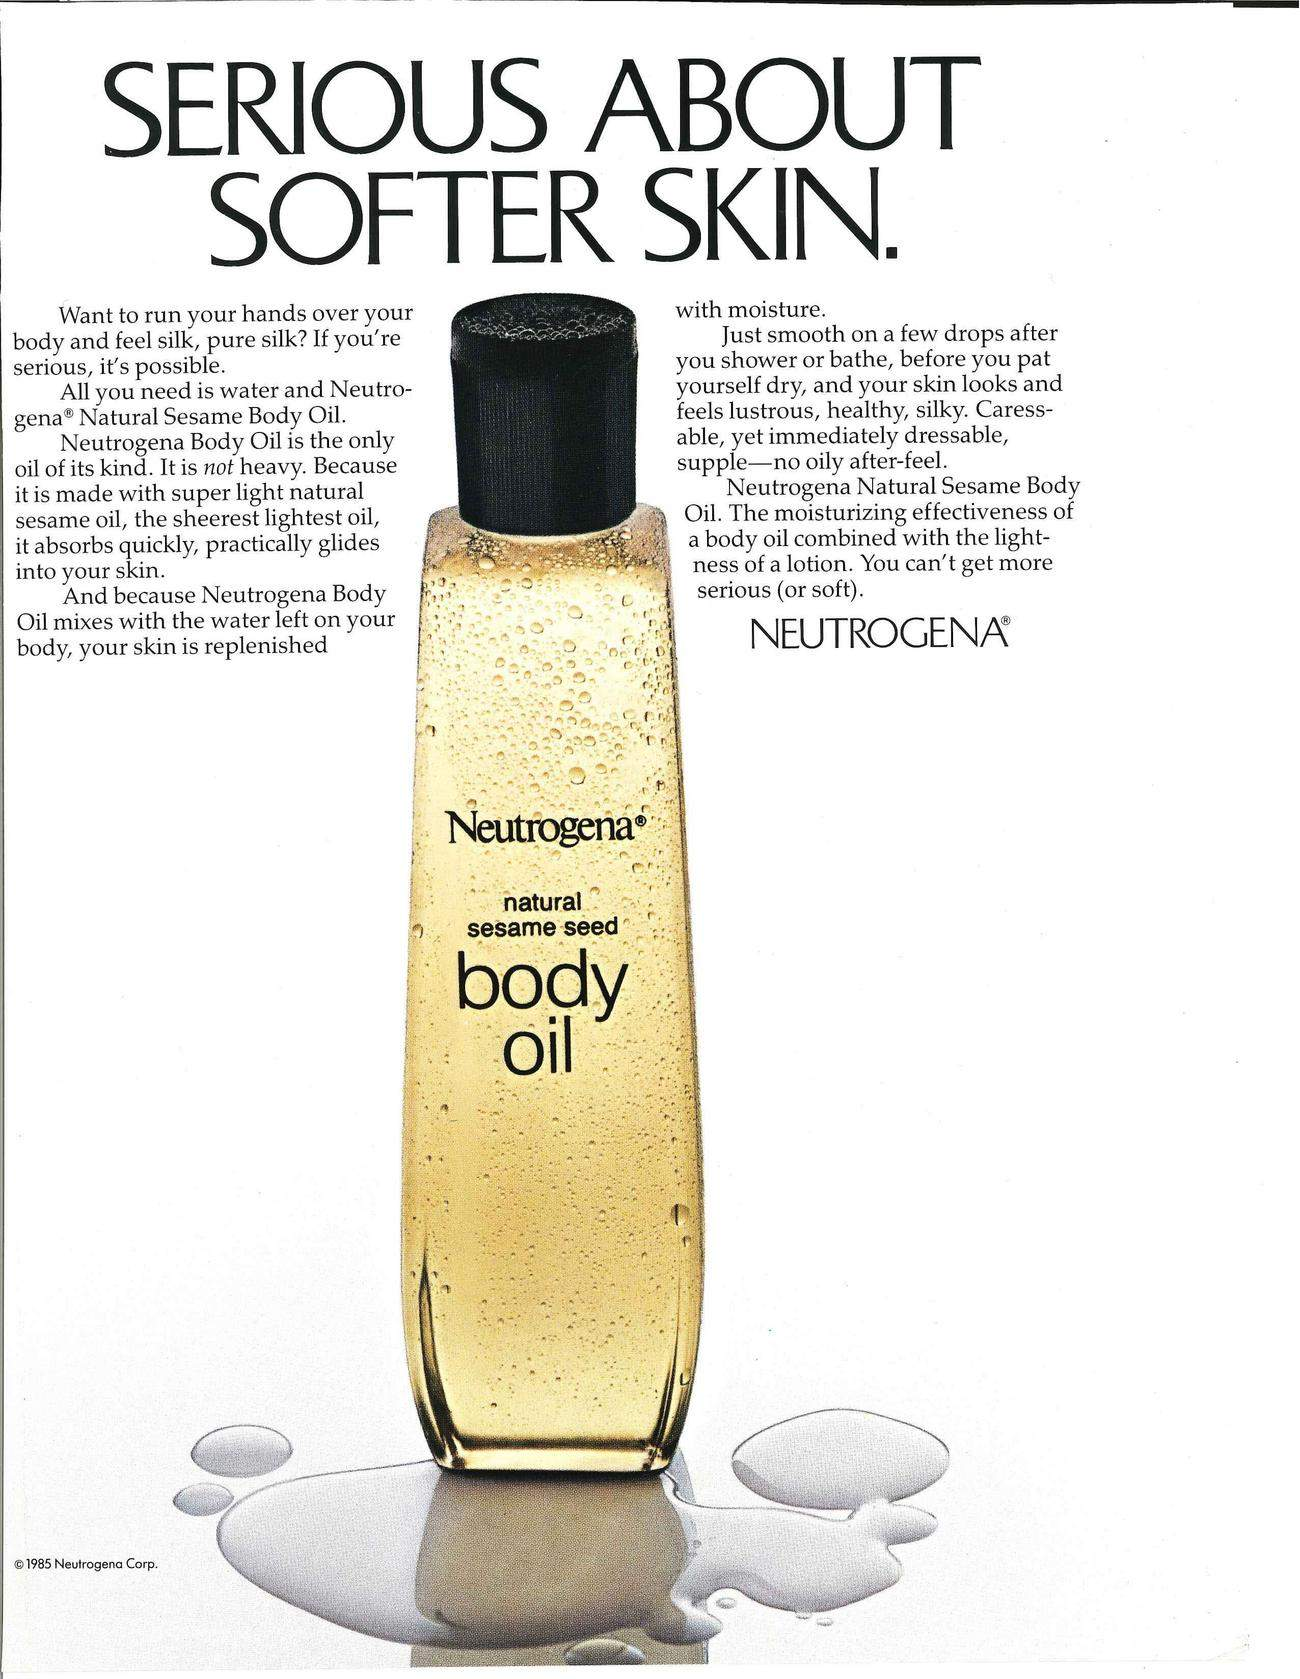 neutrogena-body-oil_1985